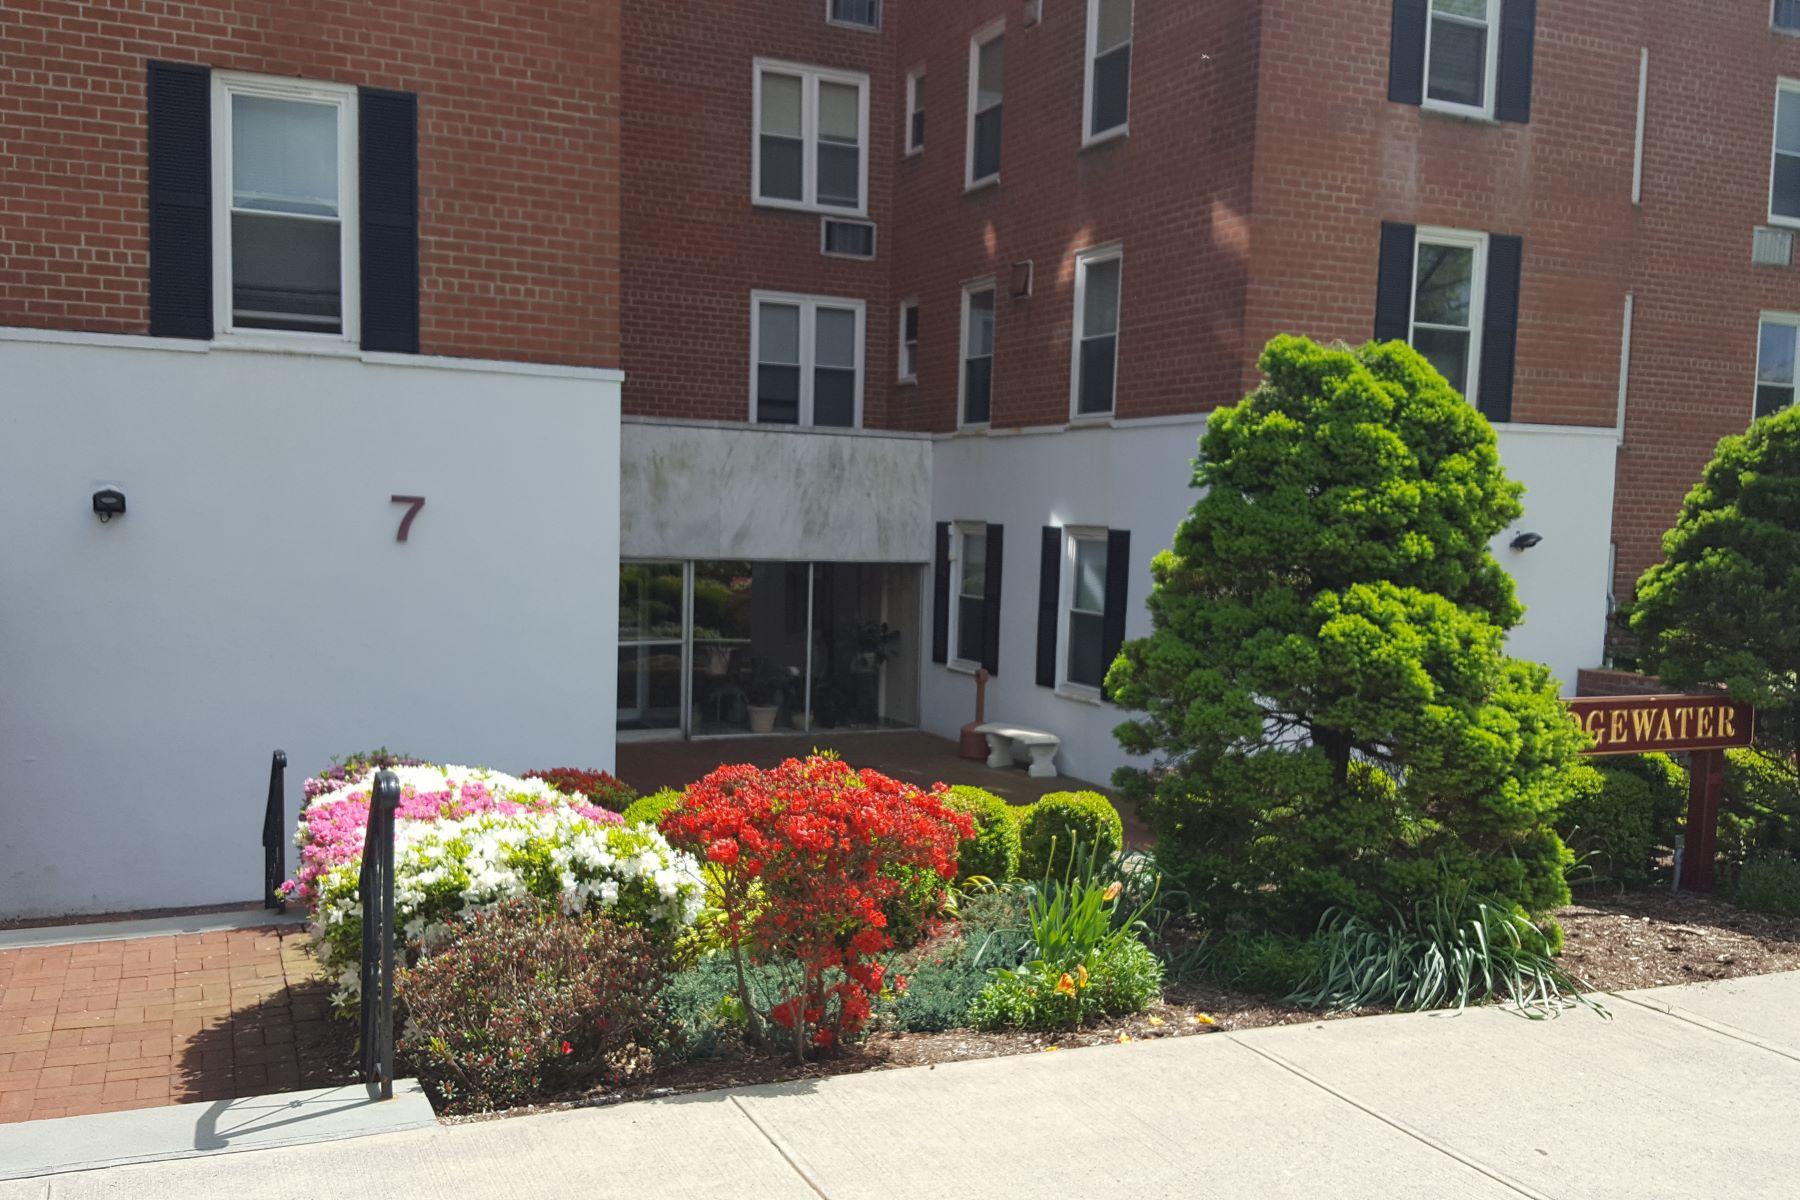 Apartamento por un Alquiler en Edgewater 7 4th Street 5G Stamford, Connecticut 06905 Estados Unidos